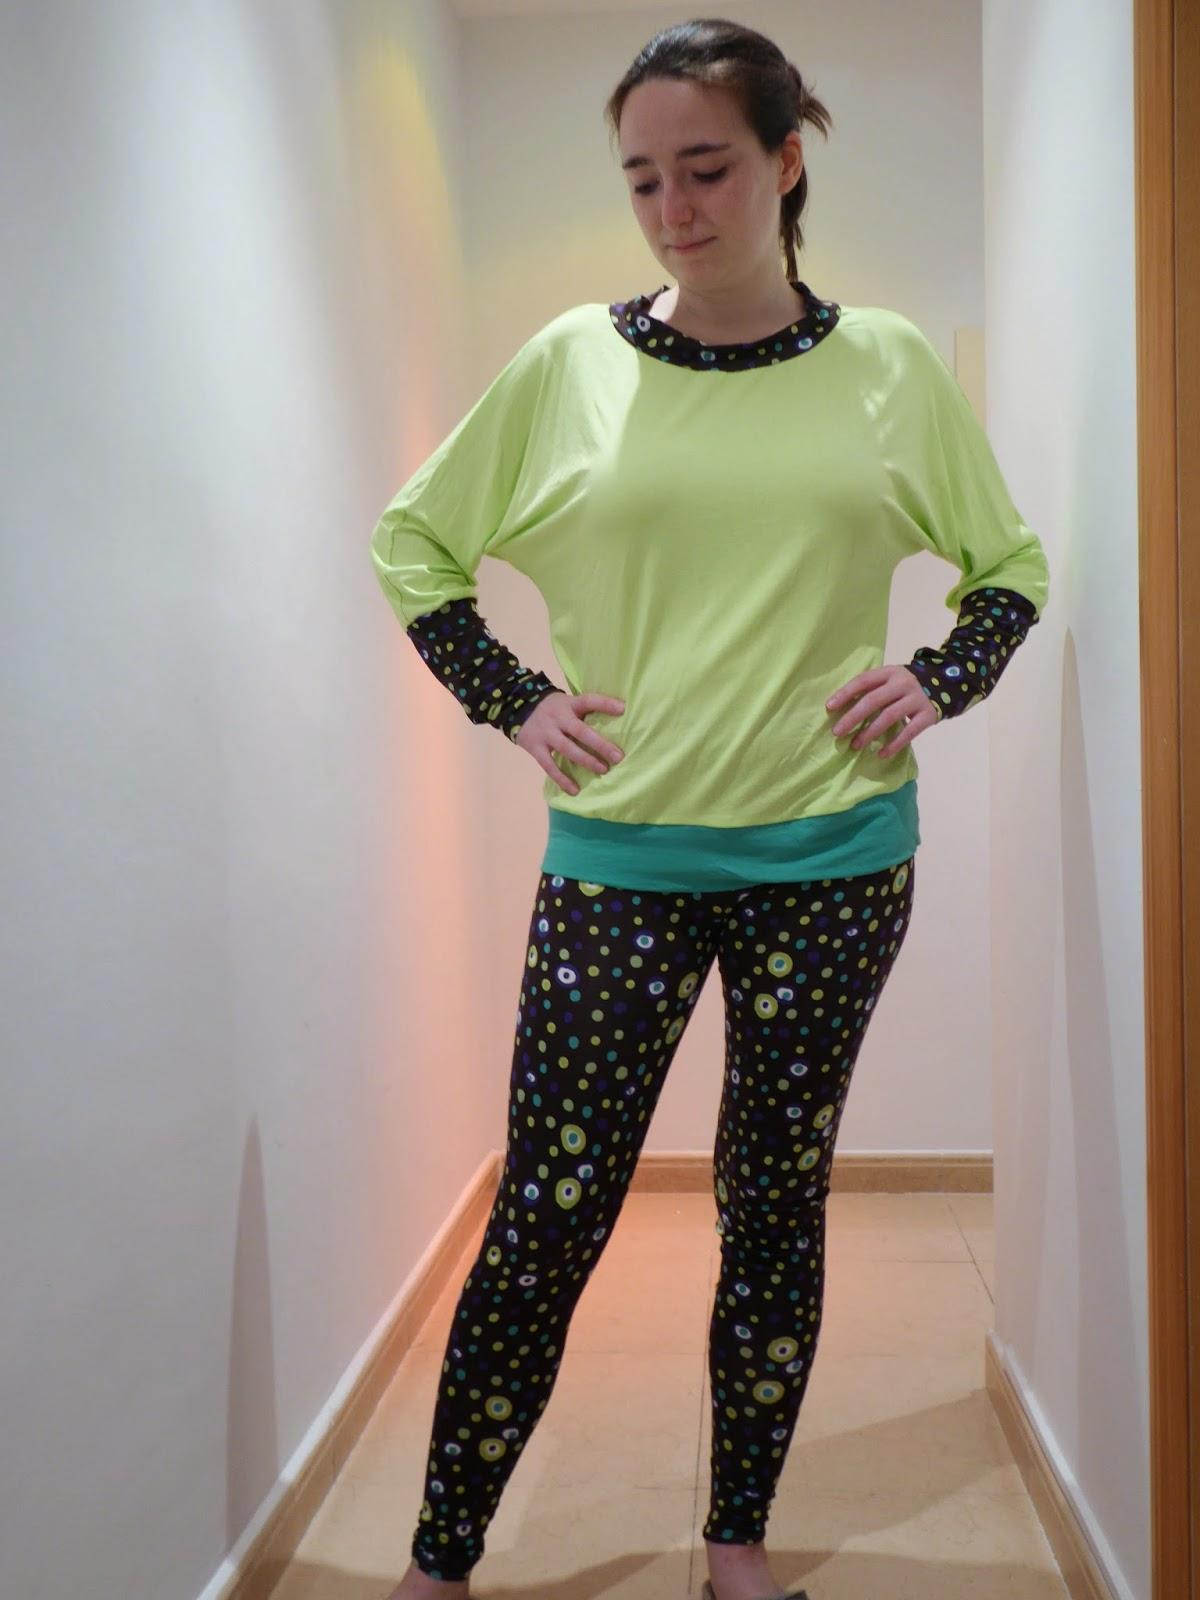 modistilla de pacotilla tela quedada blogger barcelona tela rums 50 punto leggins masustak camiseta osha mi rincon de mariposas